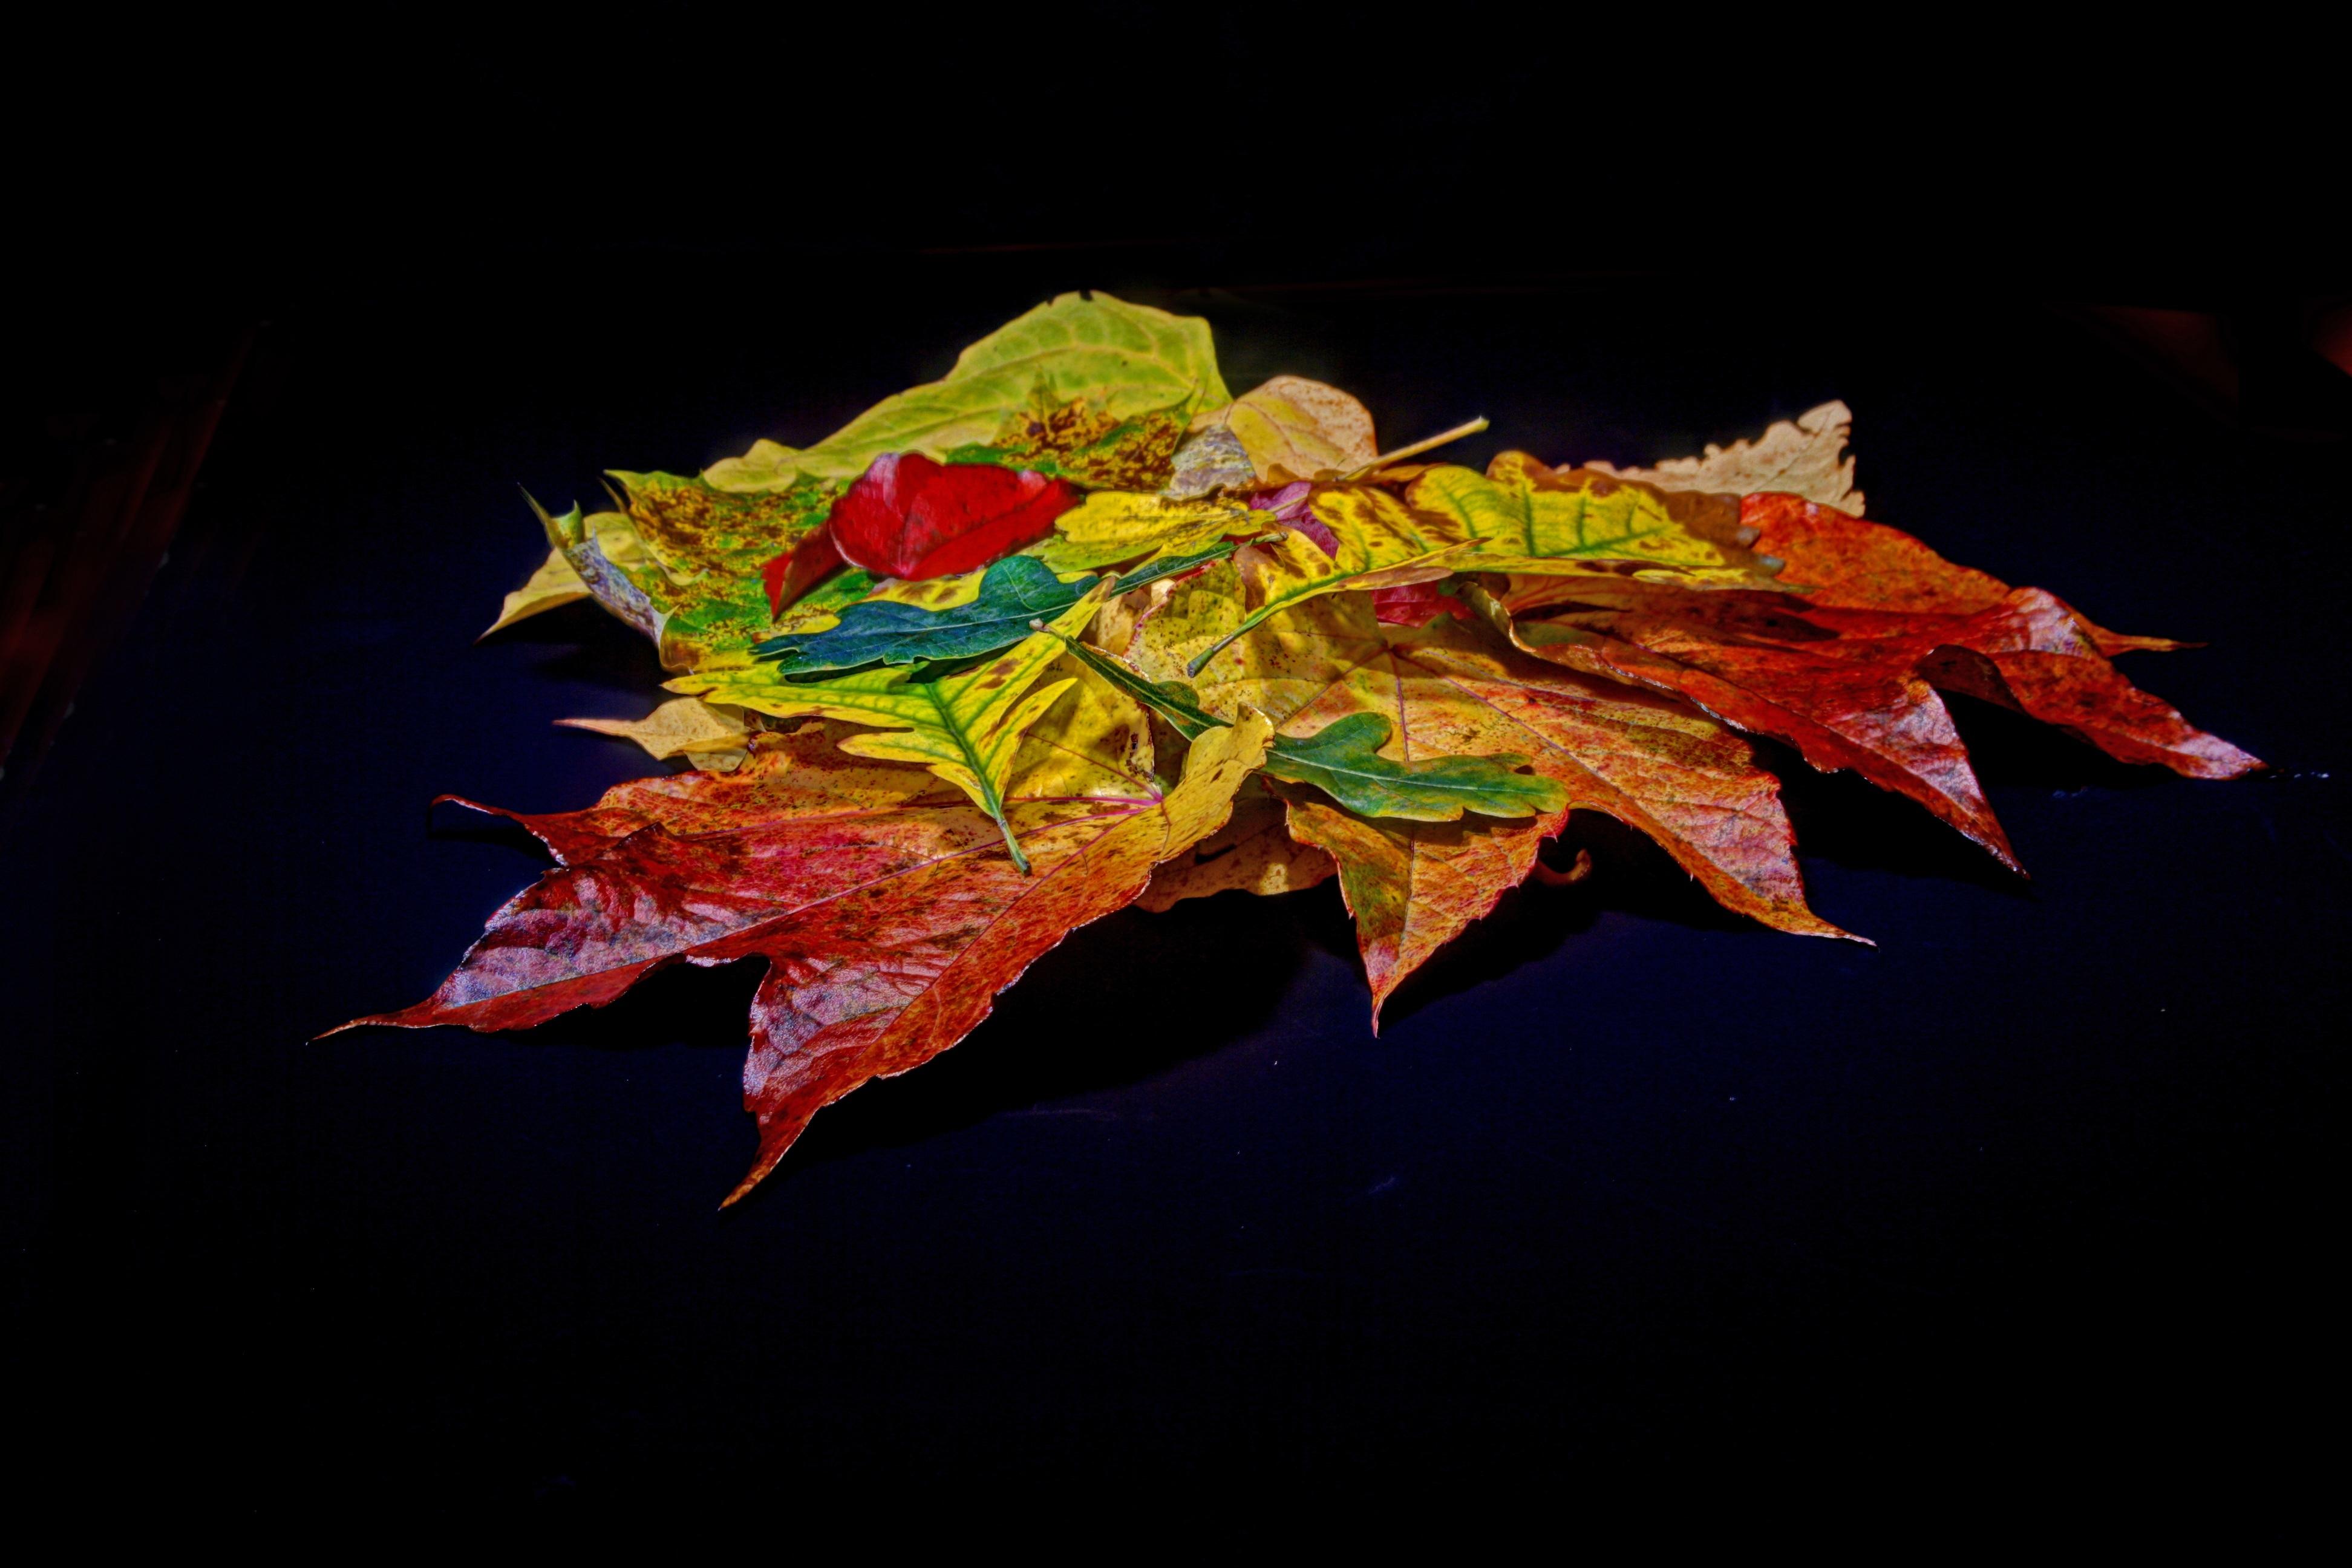 Kostenlose foto : Baum, Ast, Blatt, Blume, Grün, rot, Farbe, braun ...